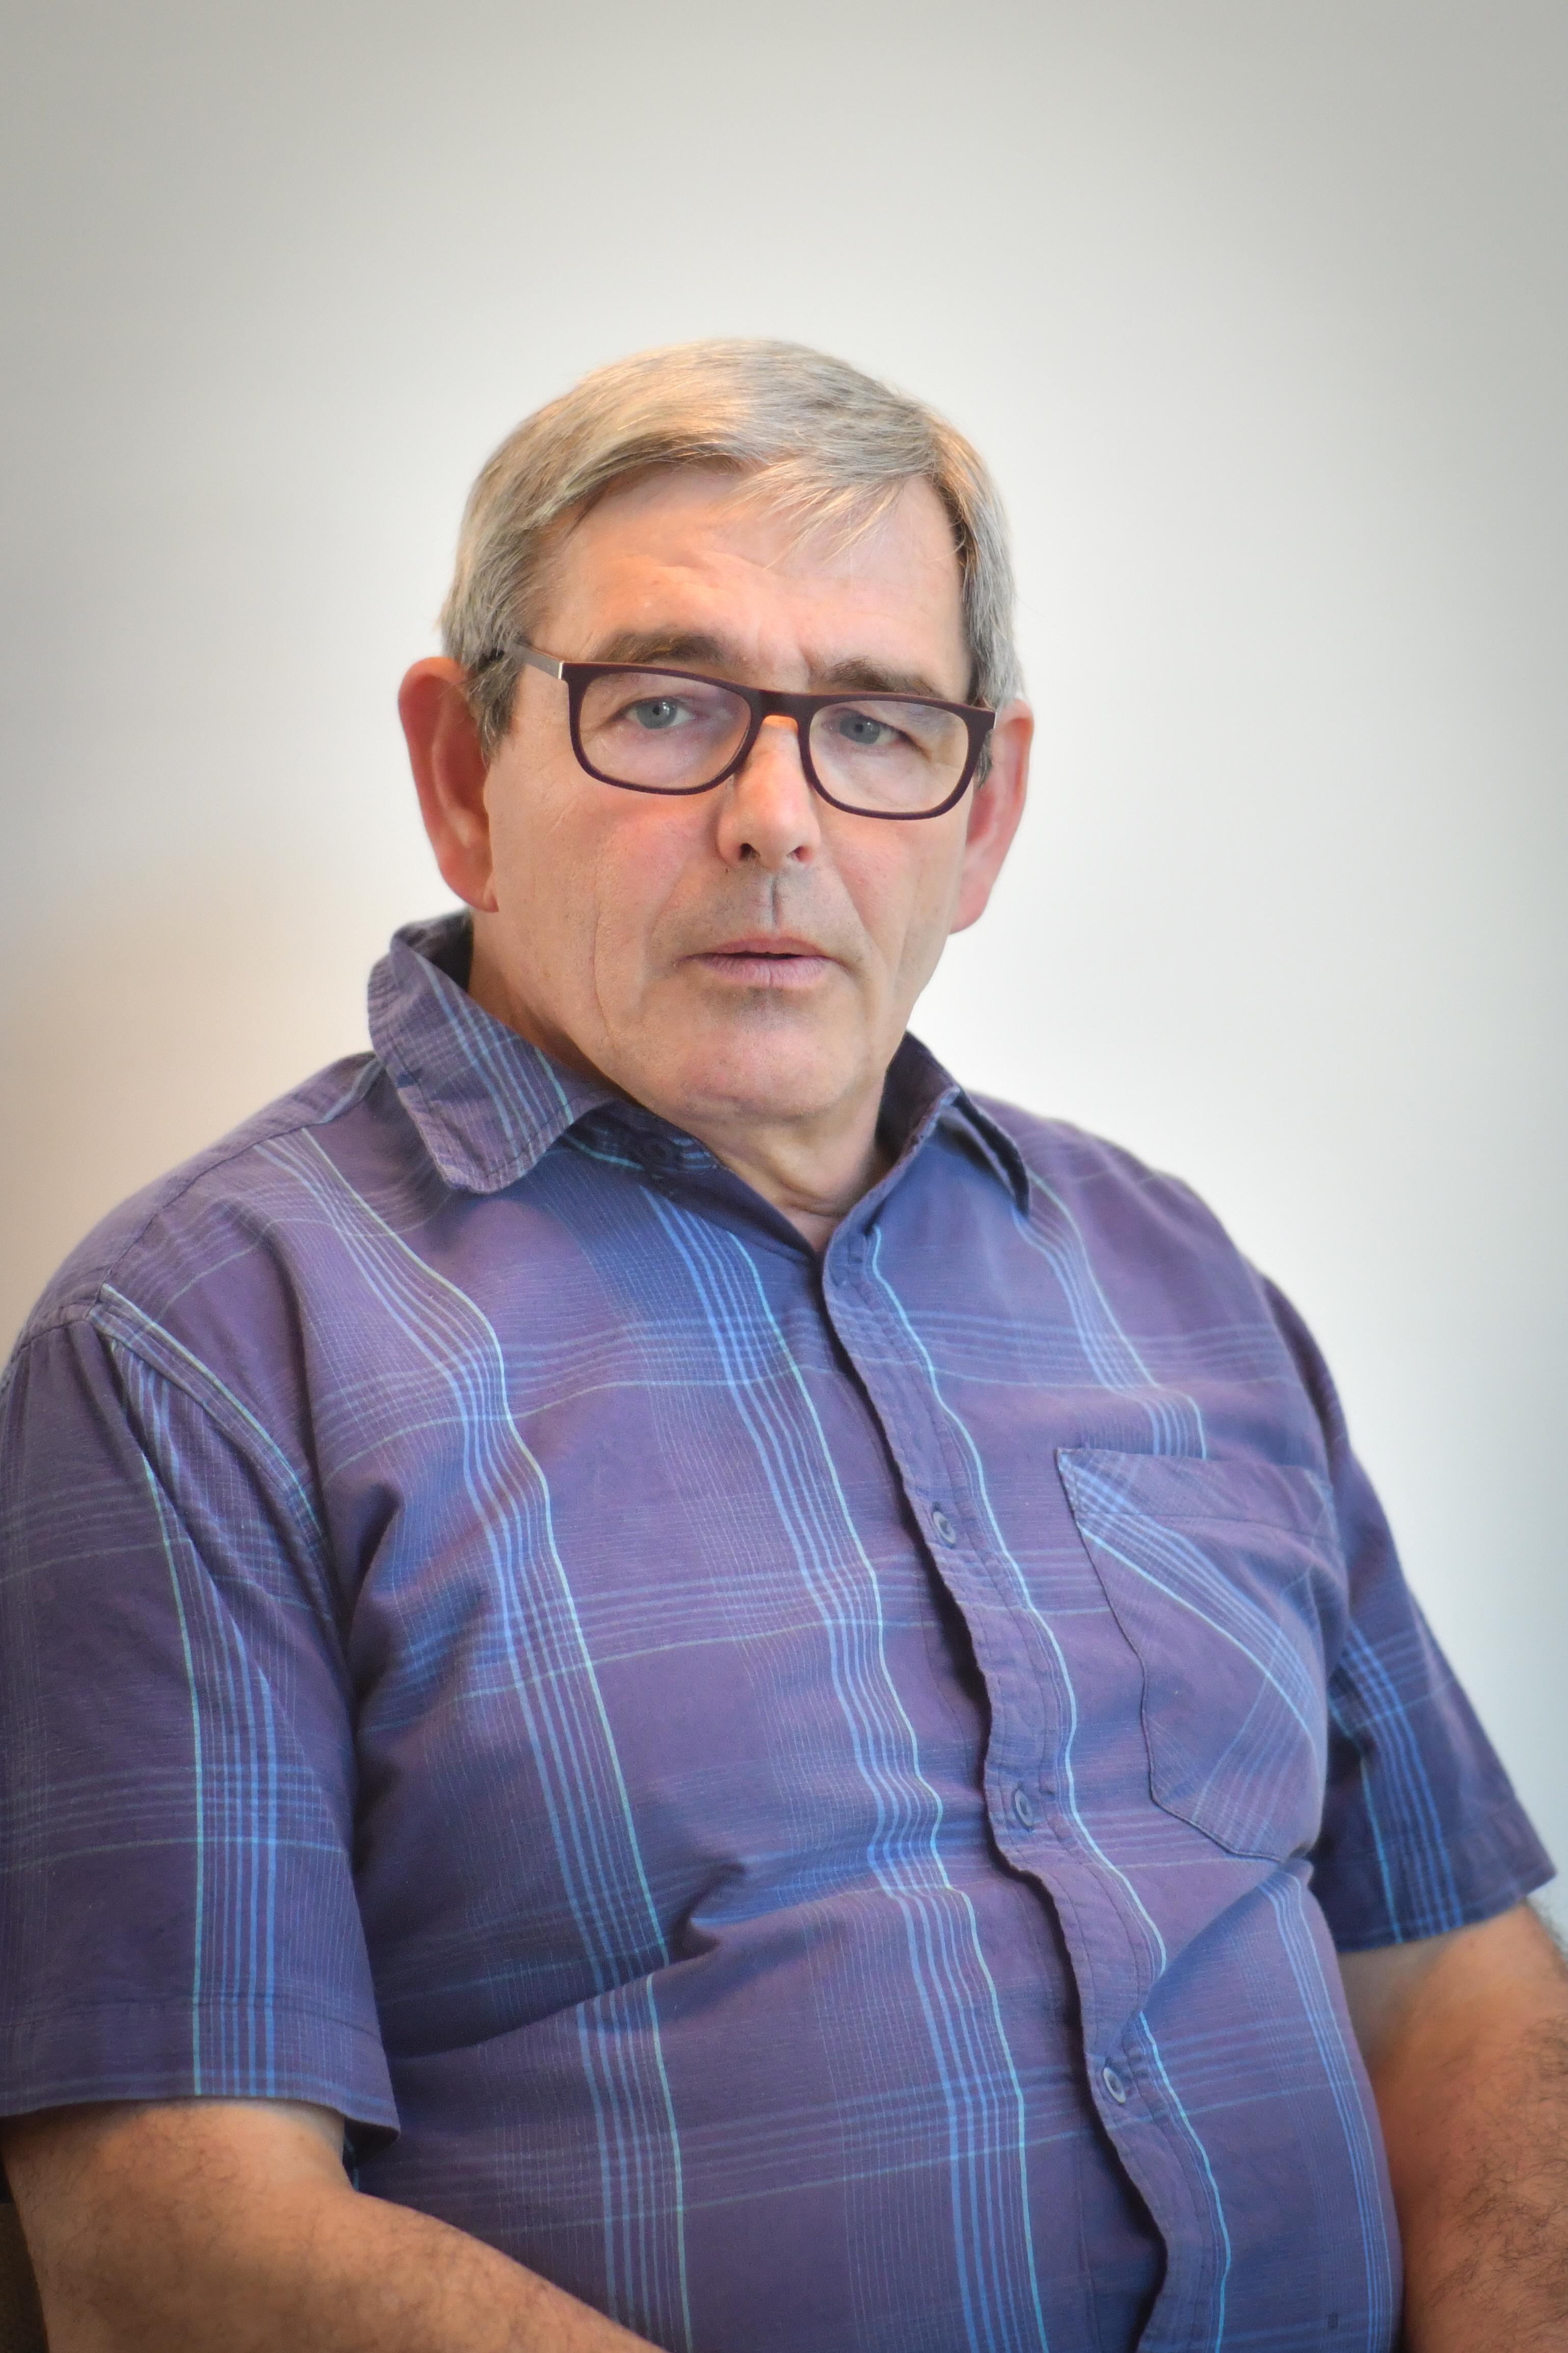 Thierry SAINT-LÔ